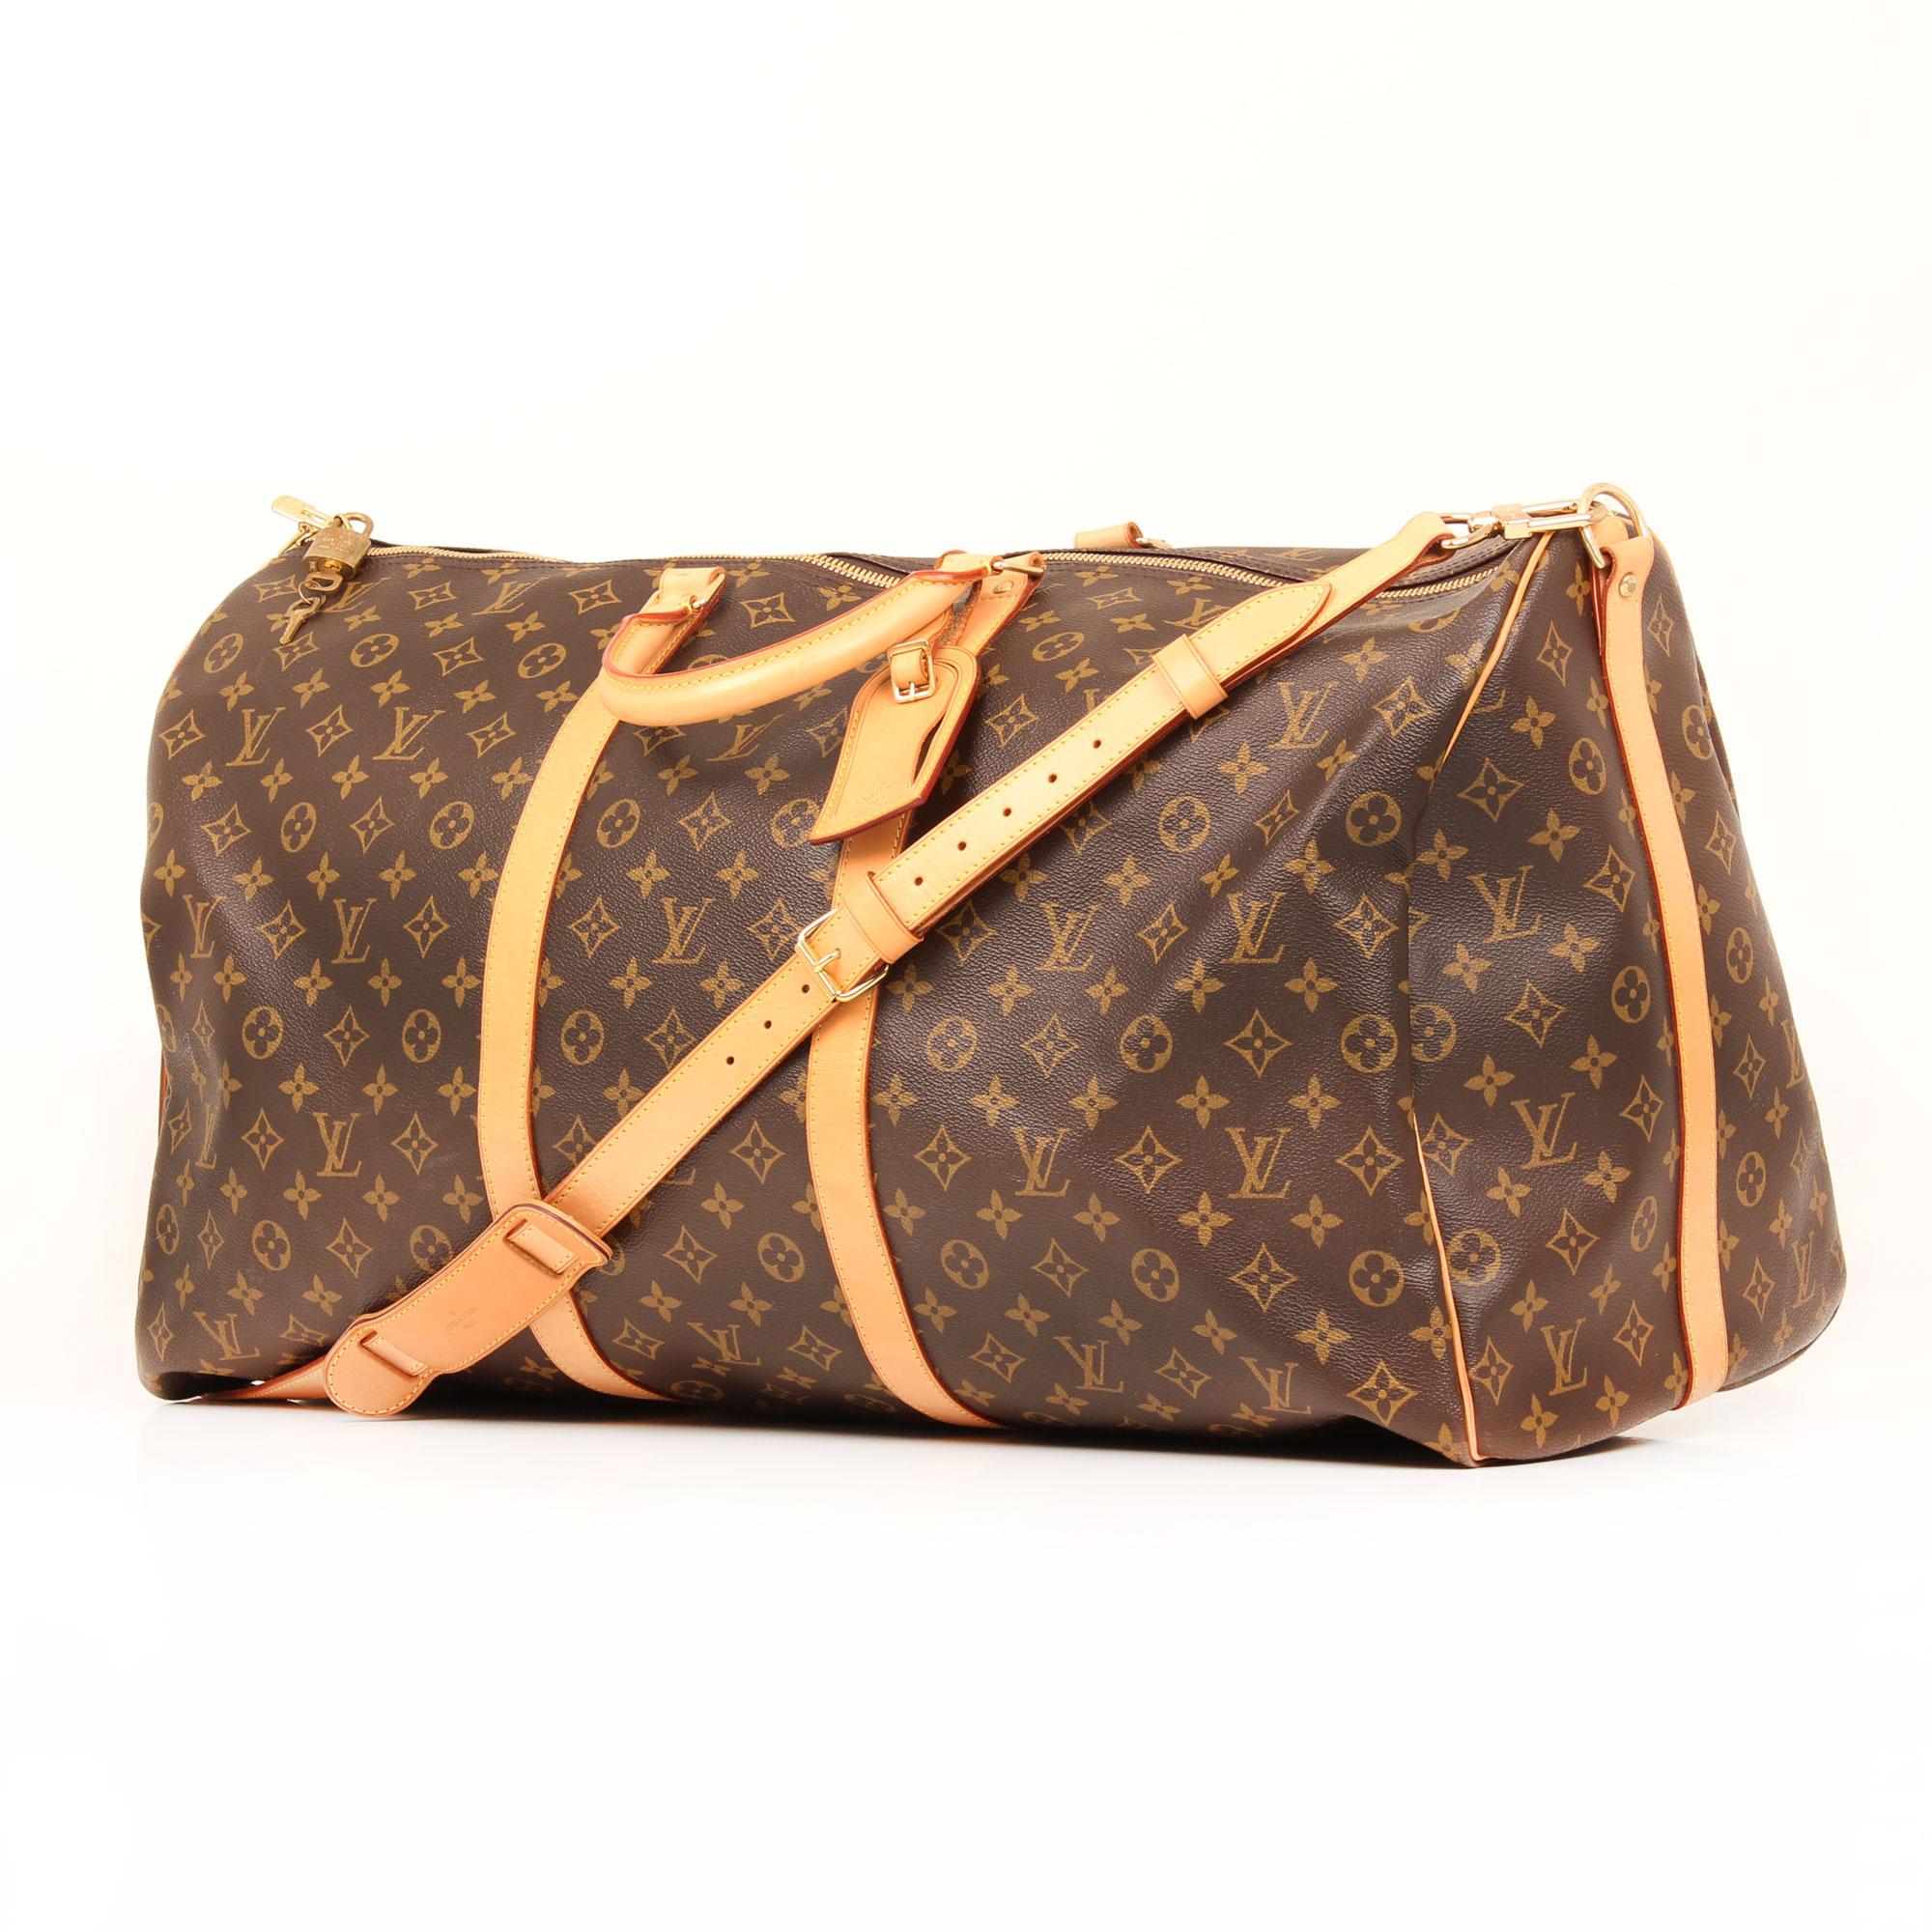 travel-bag-louis-vuitton-keepall-60-monogram-side